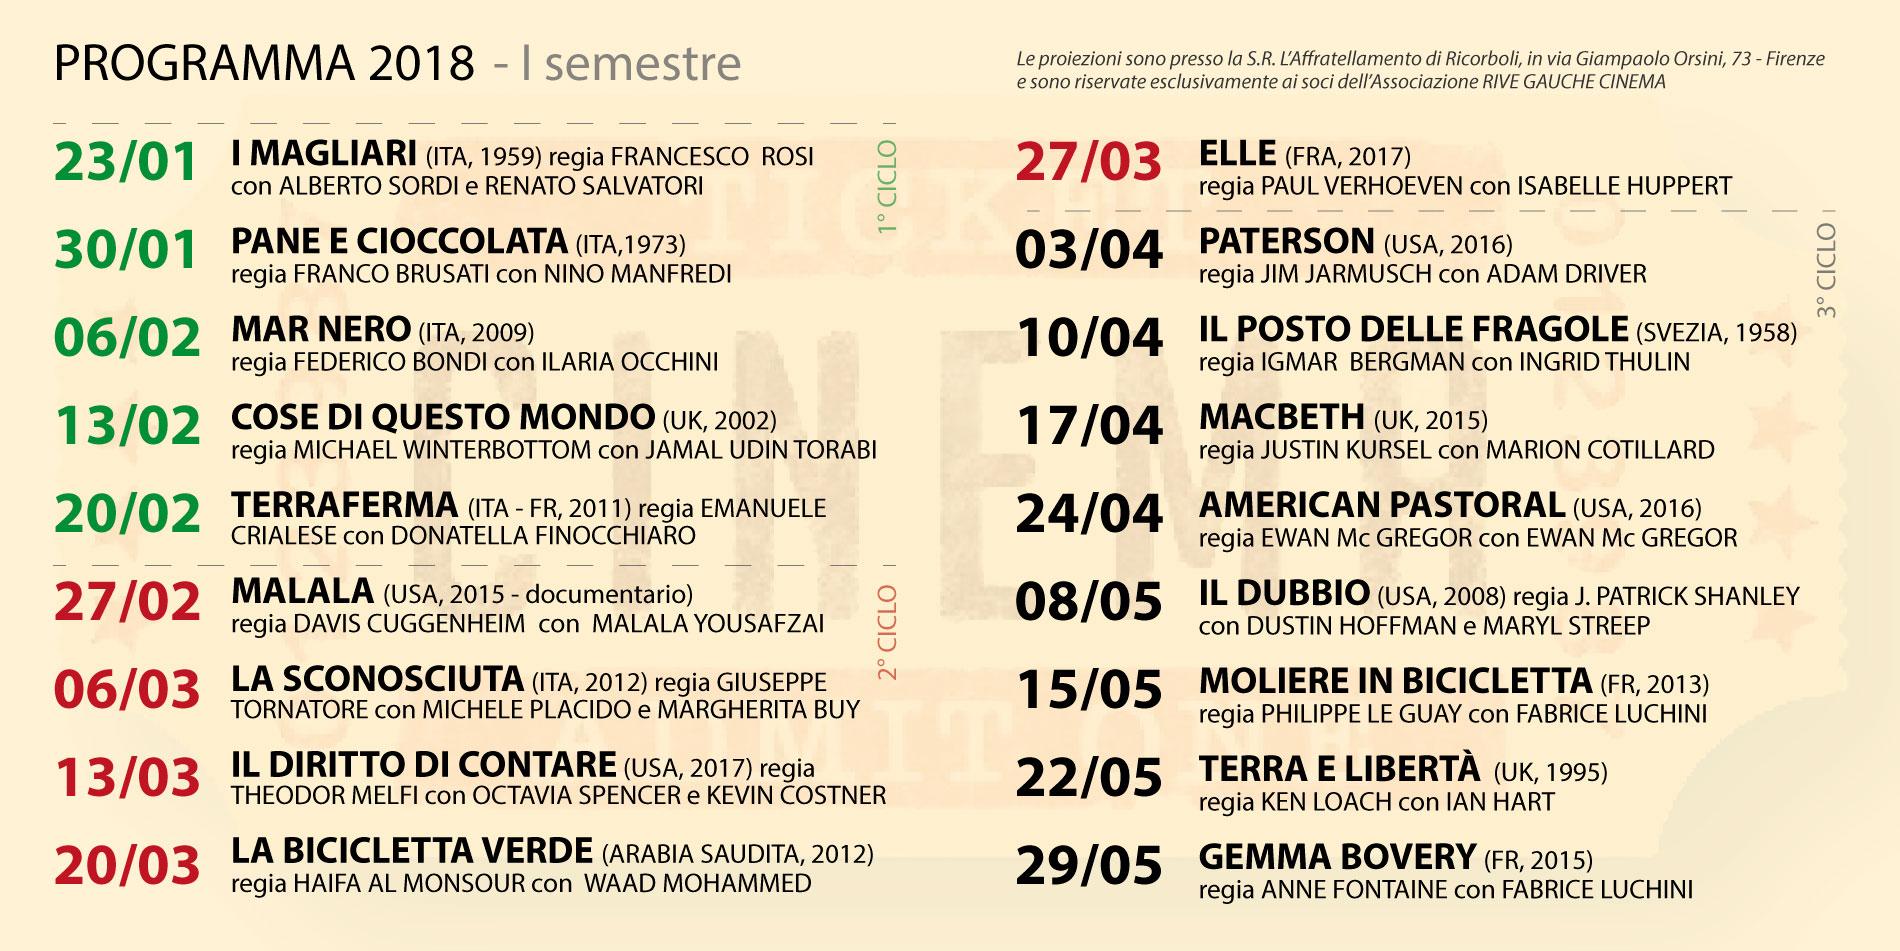 Programma 2018 - I semestre